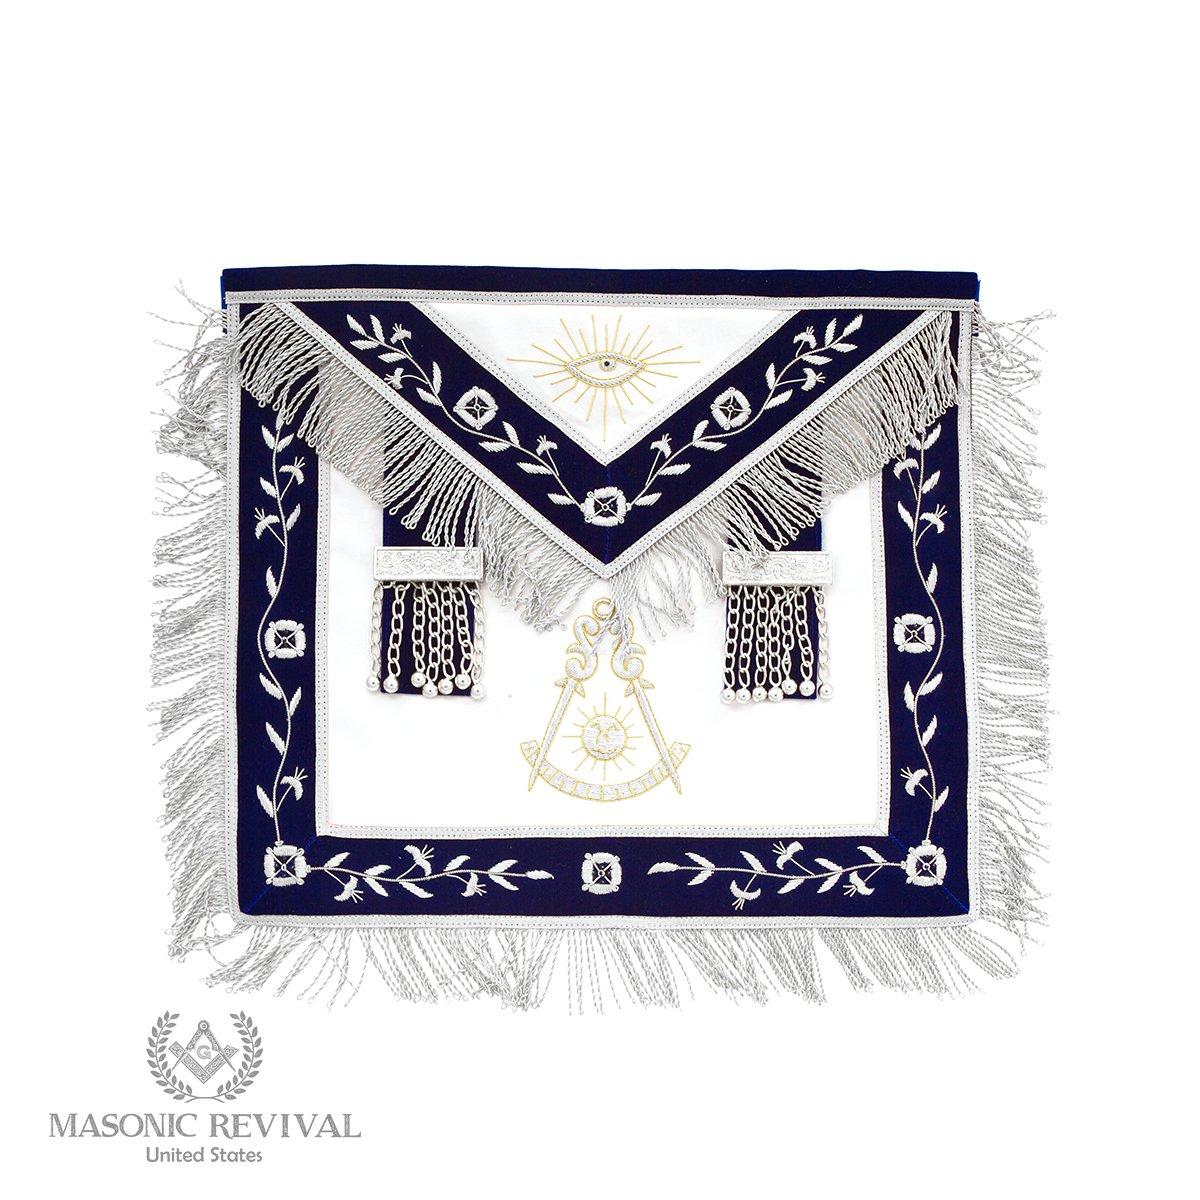 Masonic Revival El Mixto Bullion パストマスターエプロン   B07KY6T48W